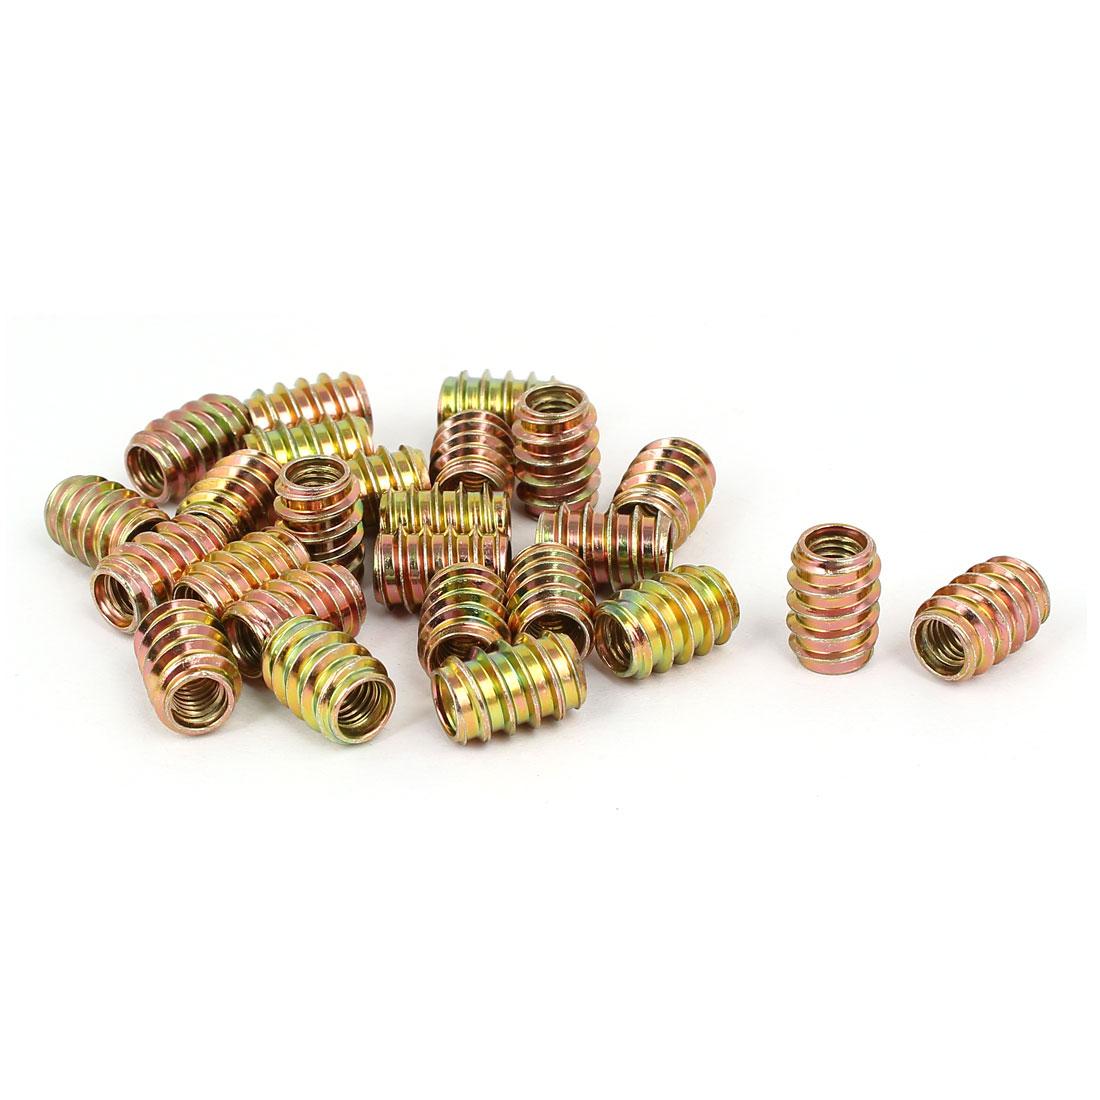 Wood Furniture Insert Fixing Screw E-Nut Bronze Tone M6 x 15mm 25pcs